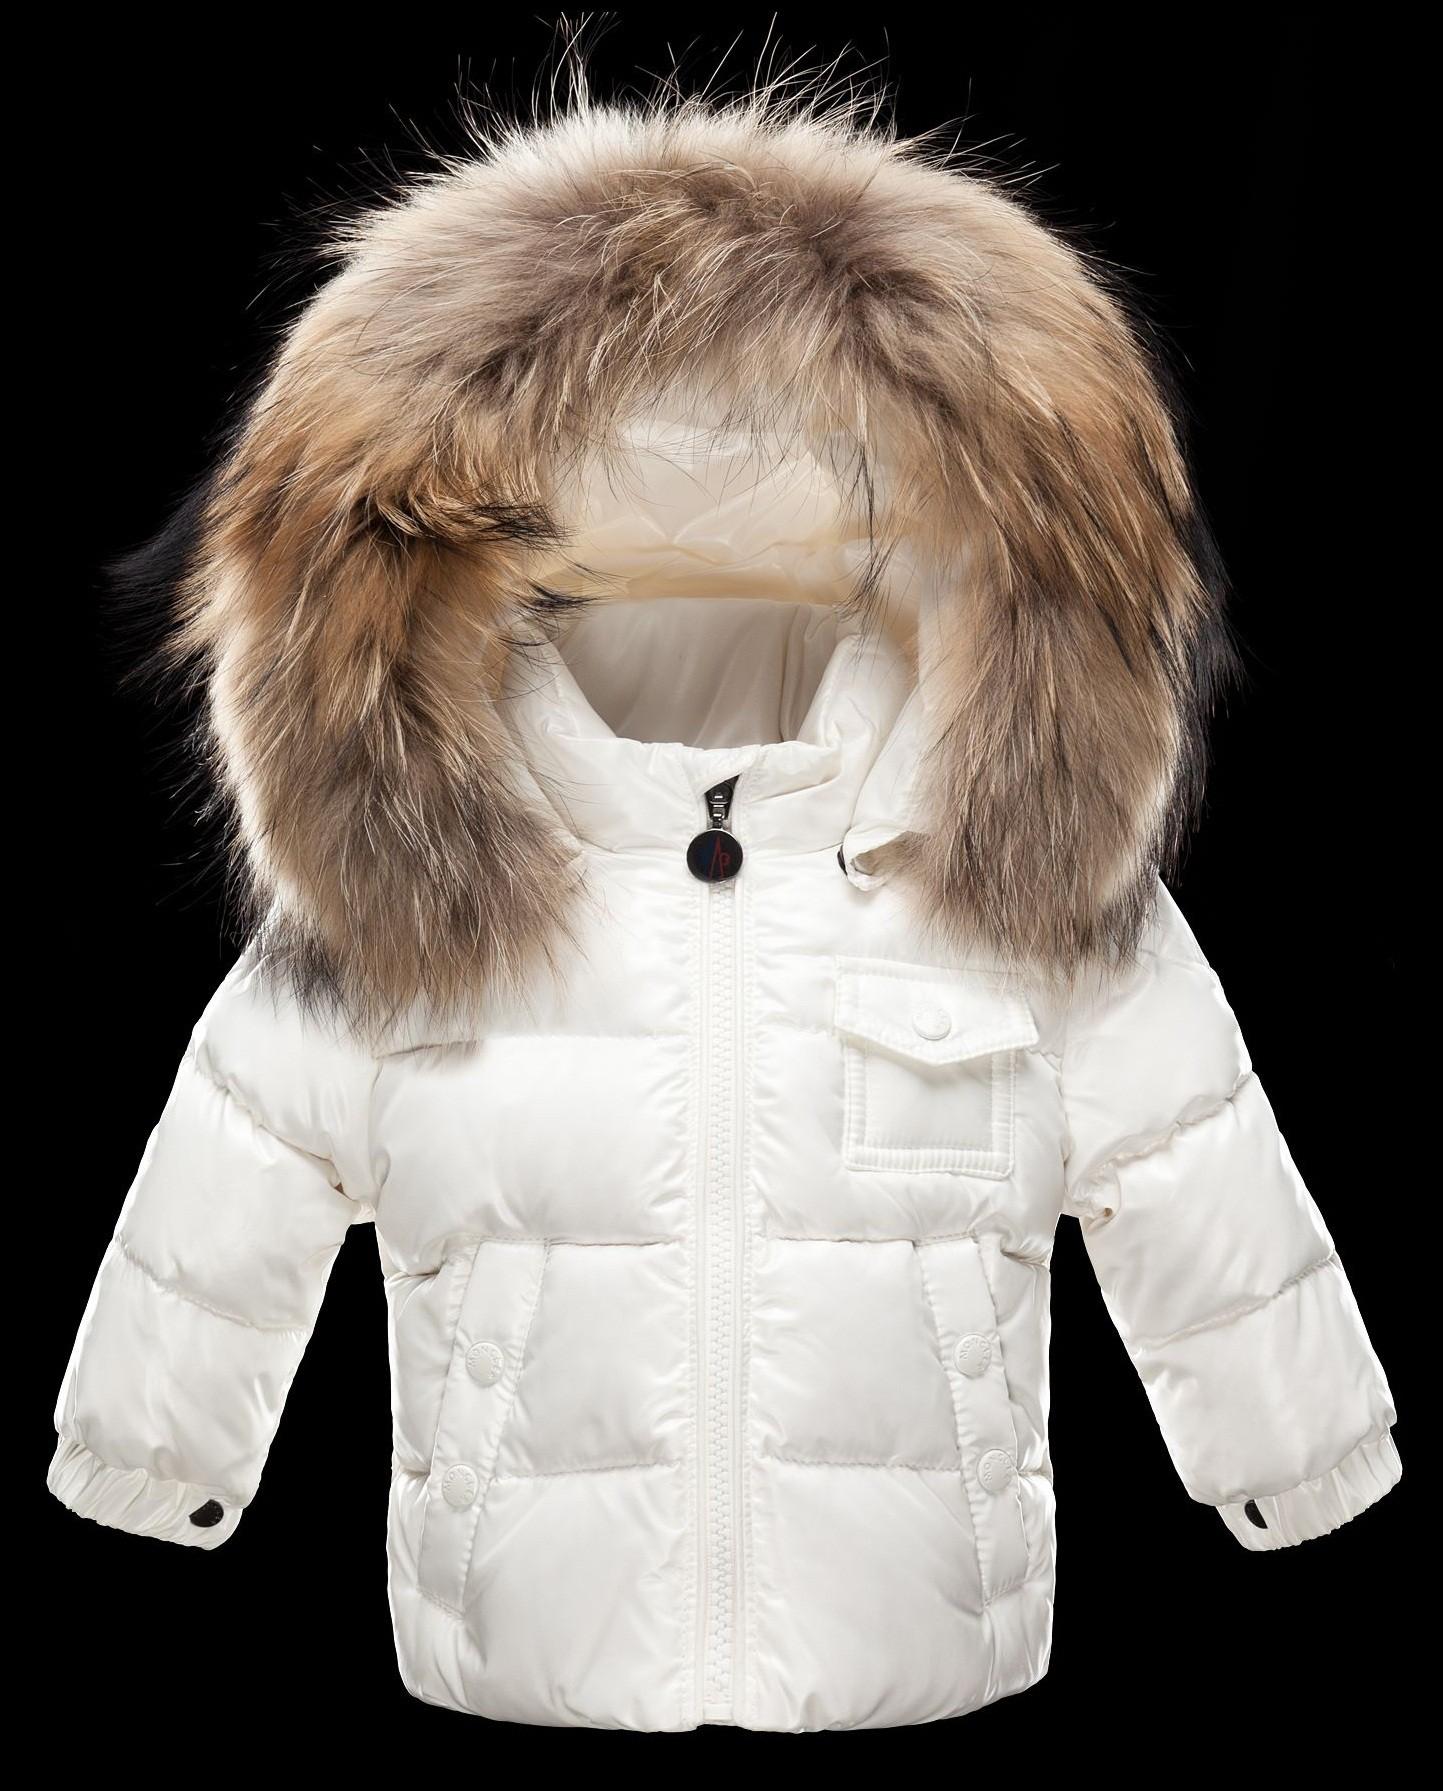 Moncler  ENFANT K2 Baby Down Jacket пуховая куртка с капюшоном 3/36 месяцев Белый